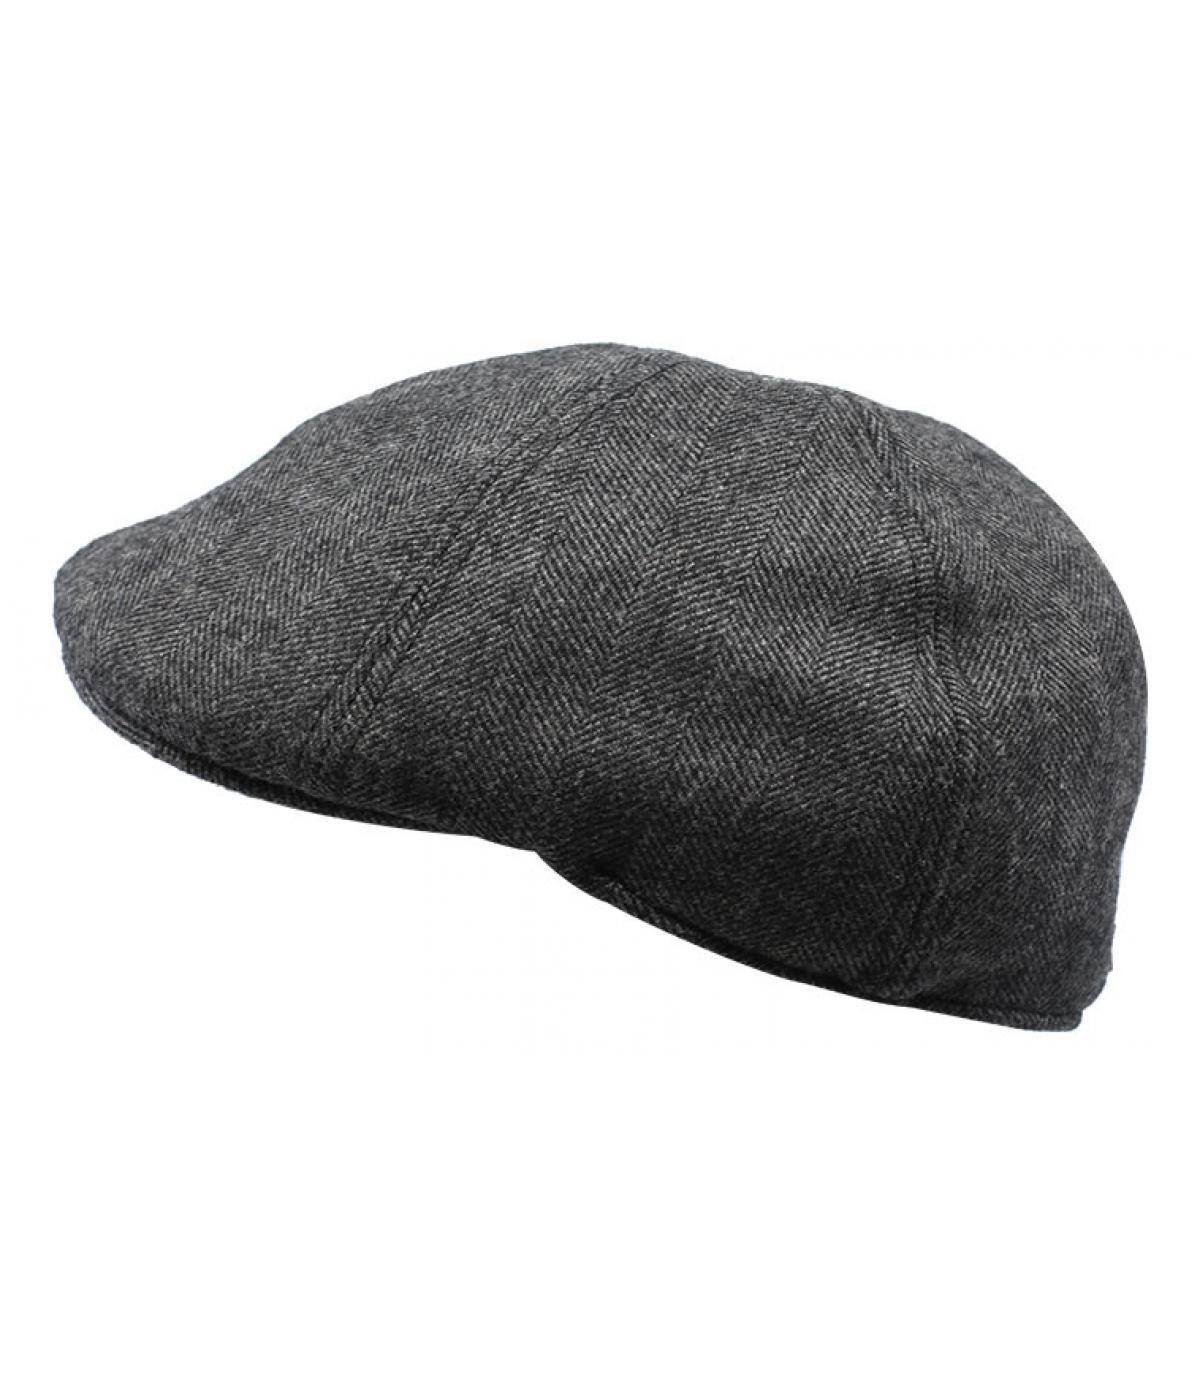 Dettagli Brentford Wool grey - image 2